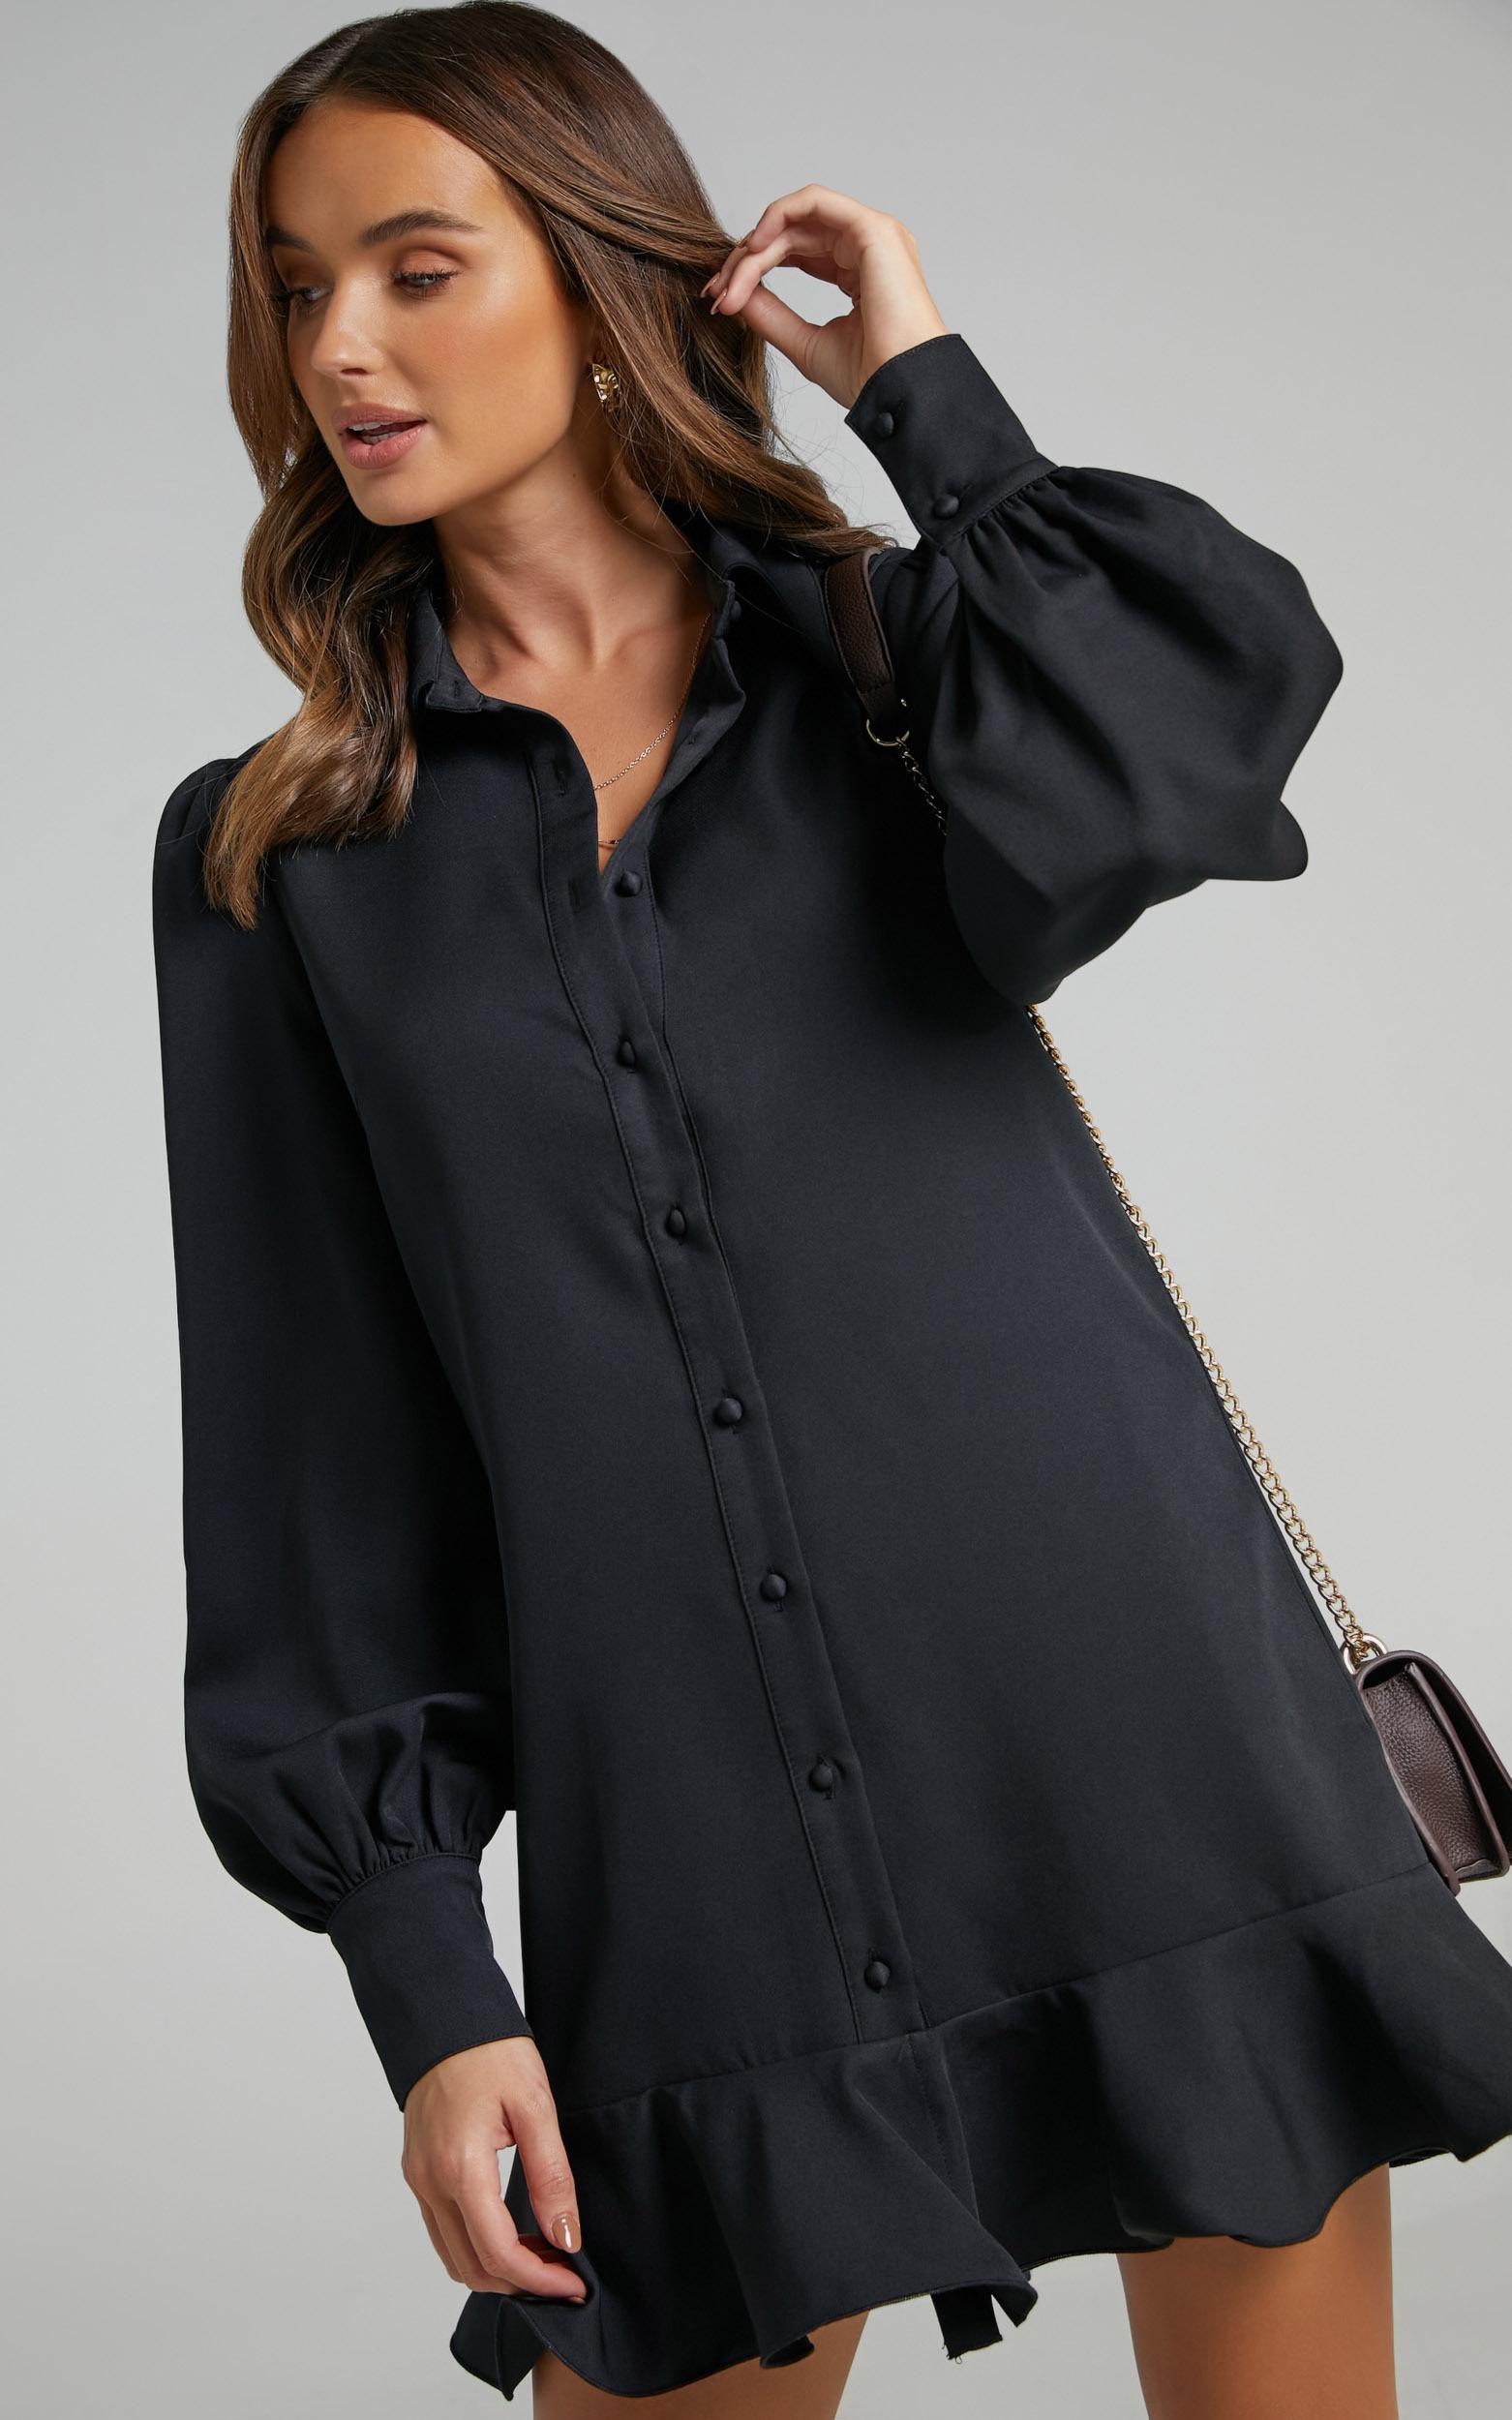 Mica Frill Hem Balloon Sleeve Shirt Mini Dress in Black - 06, BLK1, hi-res image number null